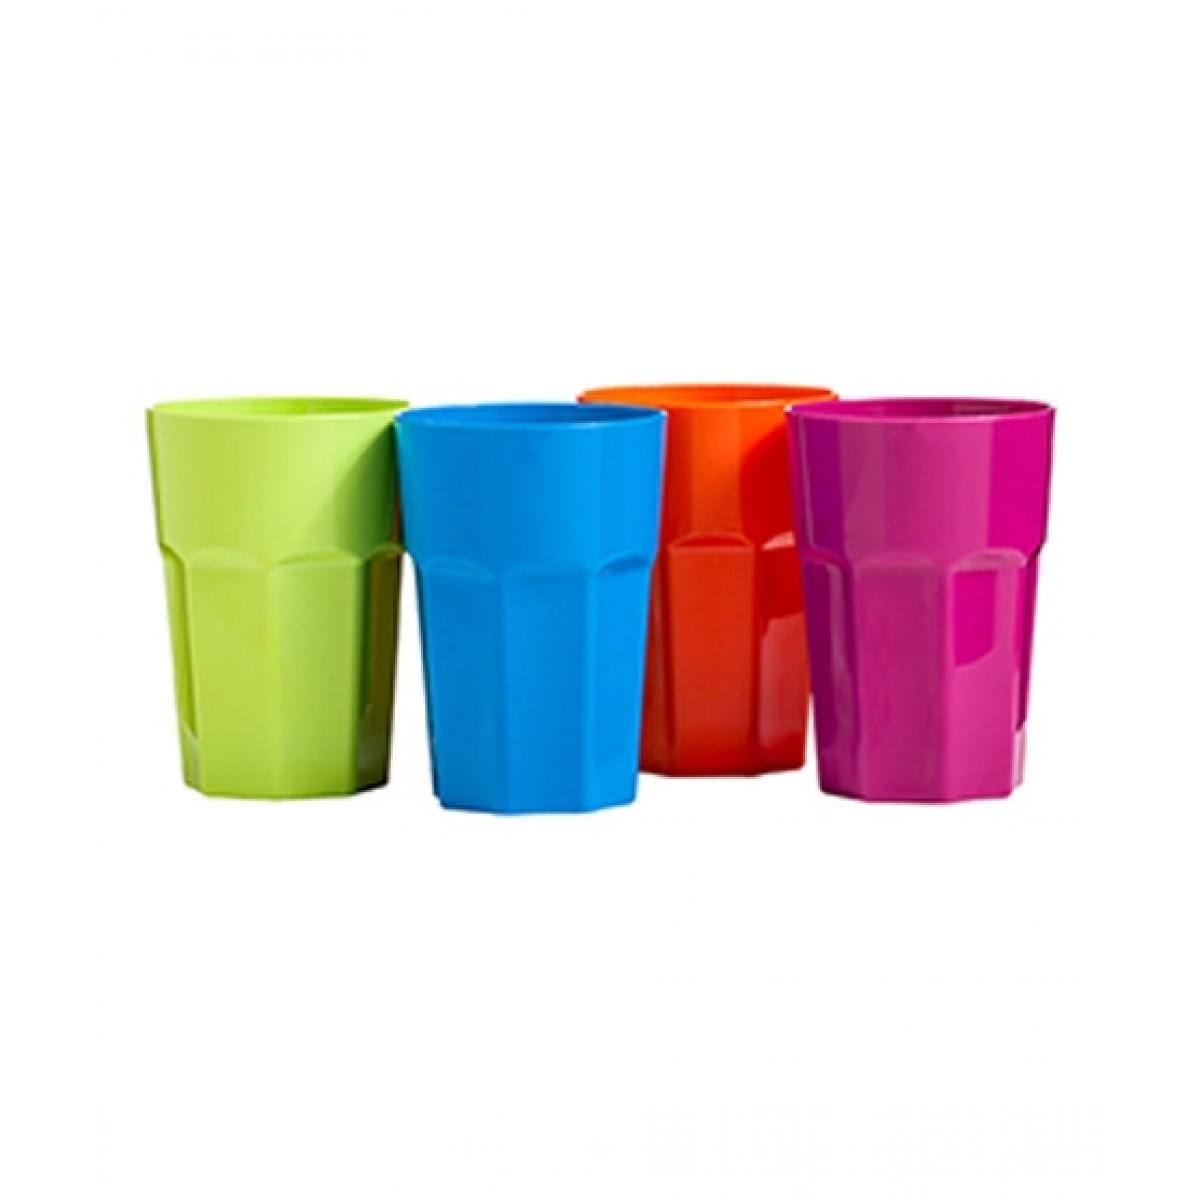 Premier Home Assorted Plastic Tumblers Set of 4 440ml (1206302)